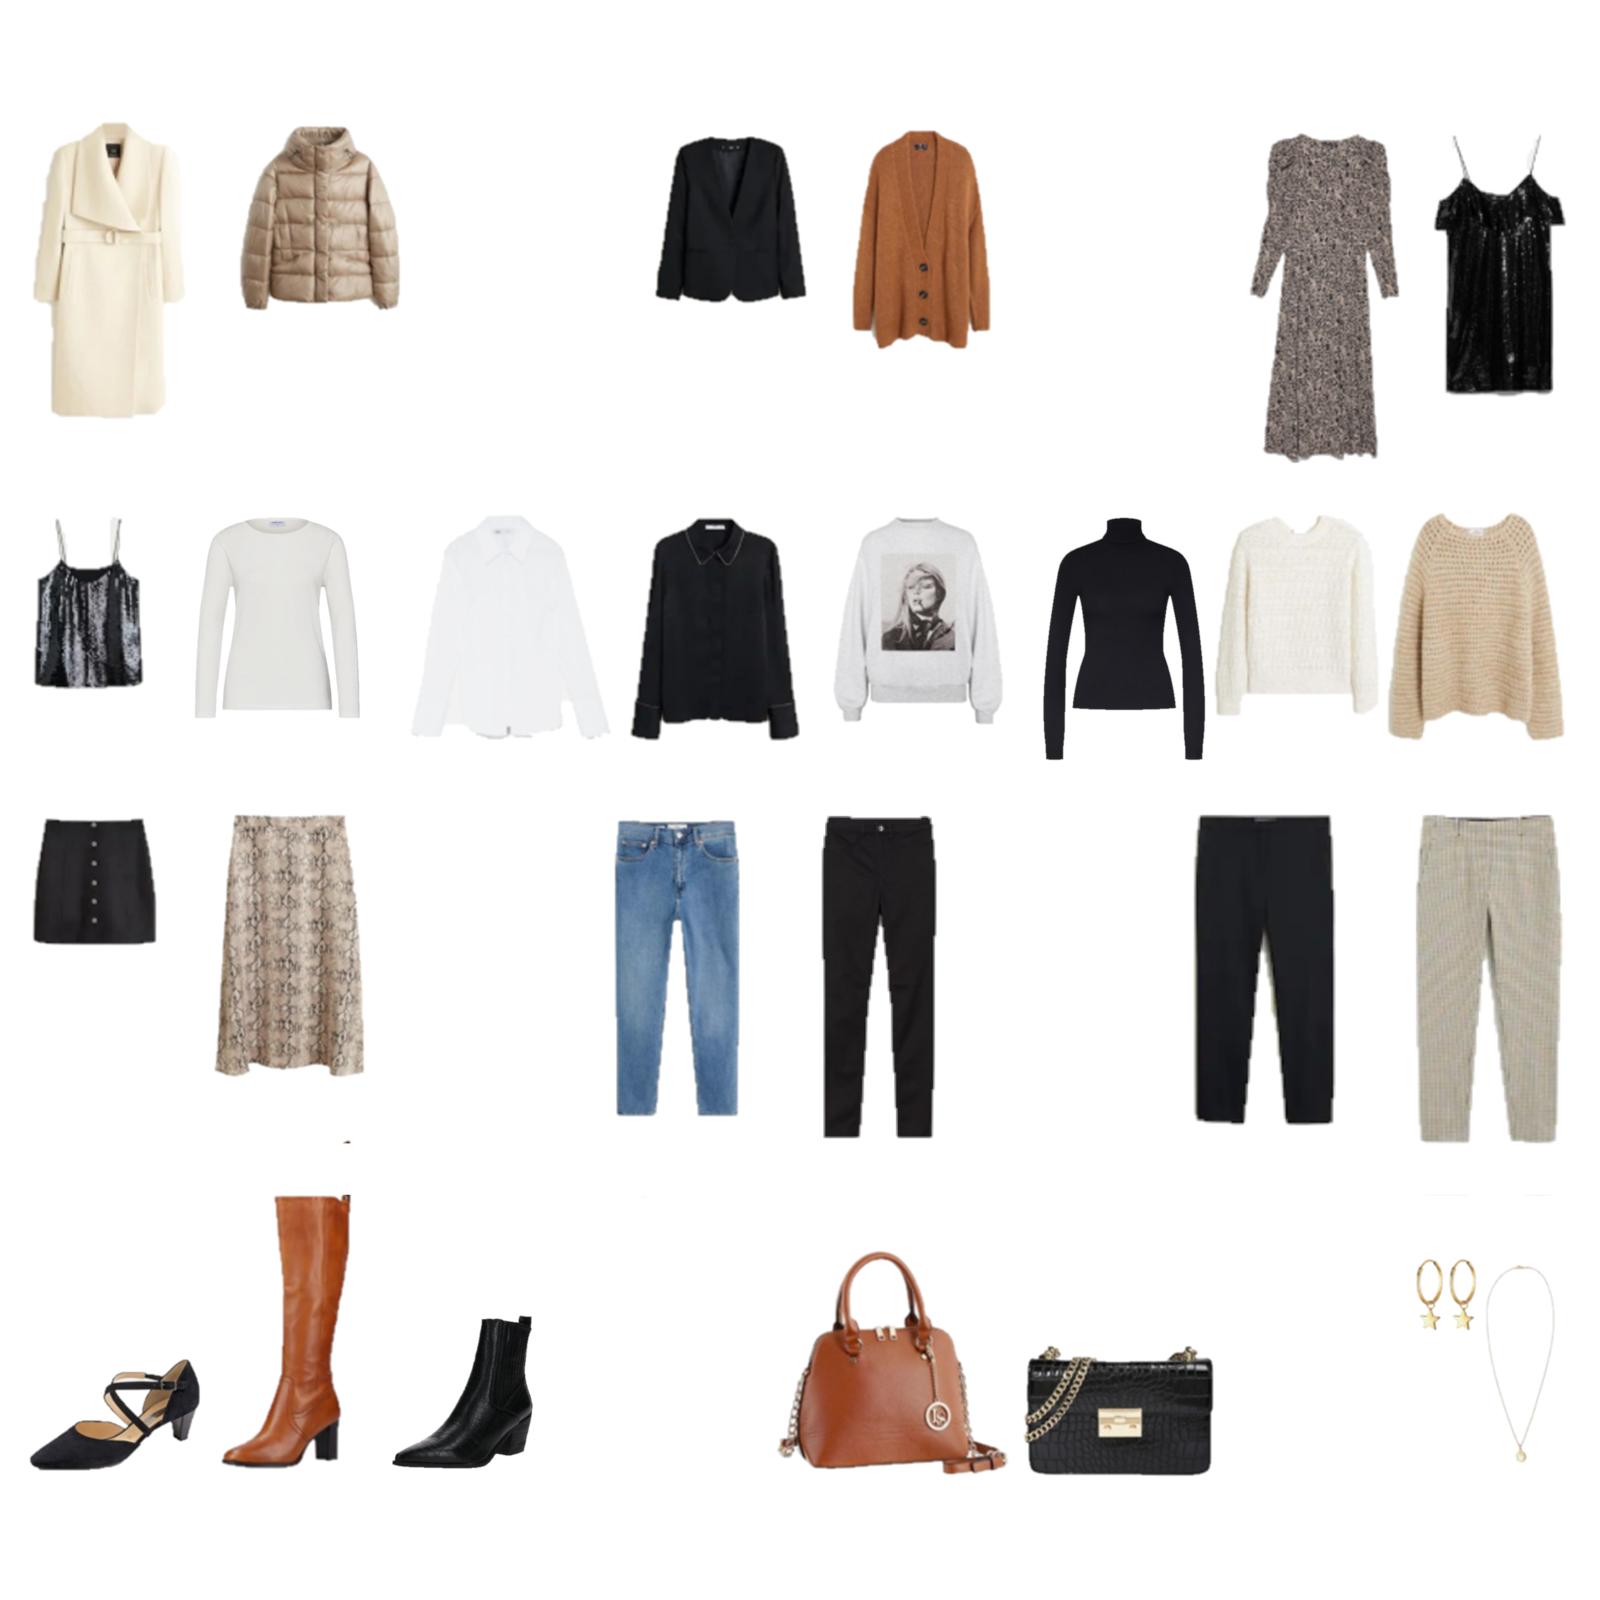 Winter Capsule Wardrobe 2020